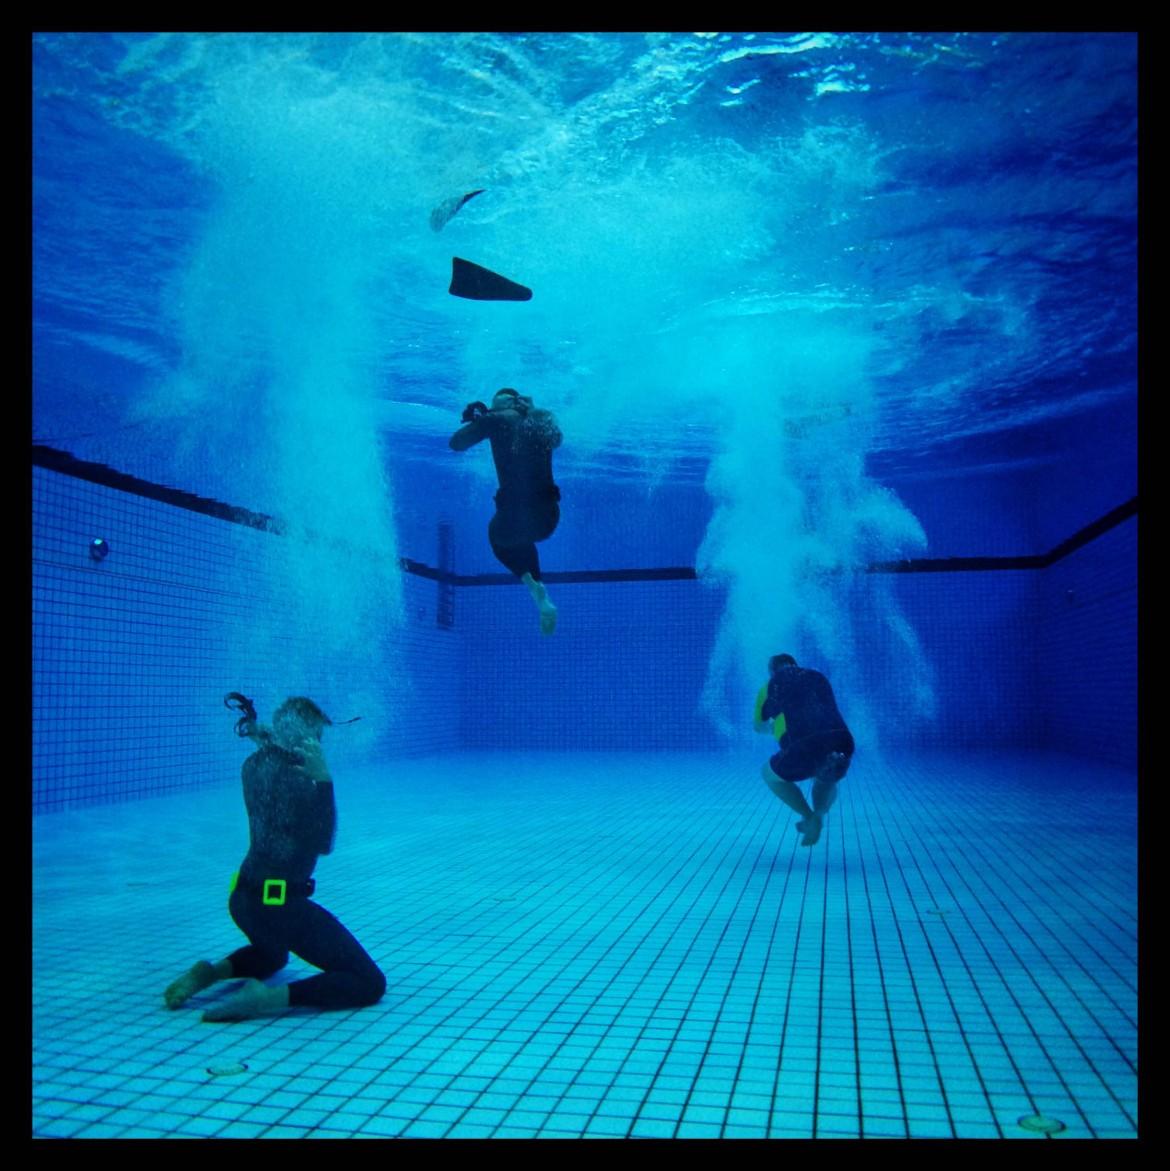 Spring fra femmeren alternative klubmesterskaber bellahøj kfk københavns fridykkerklub undervandsfoto fridykning